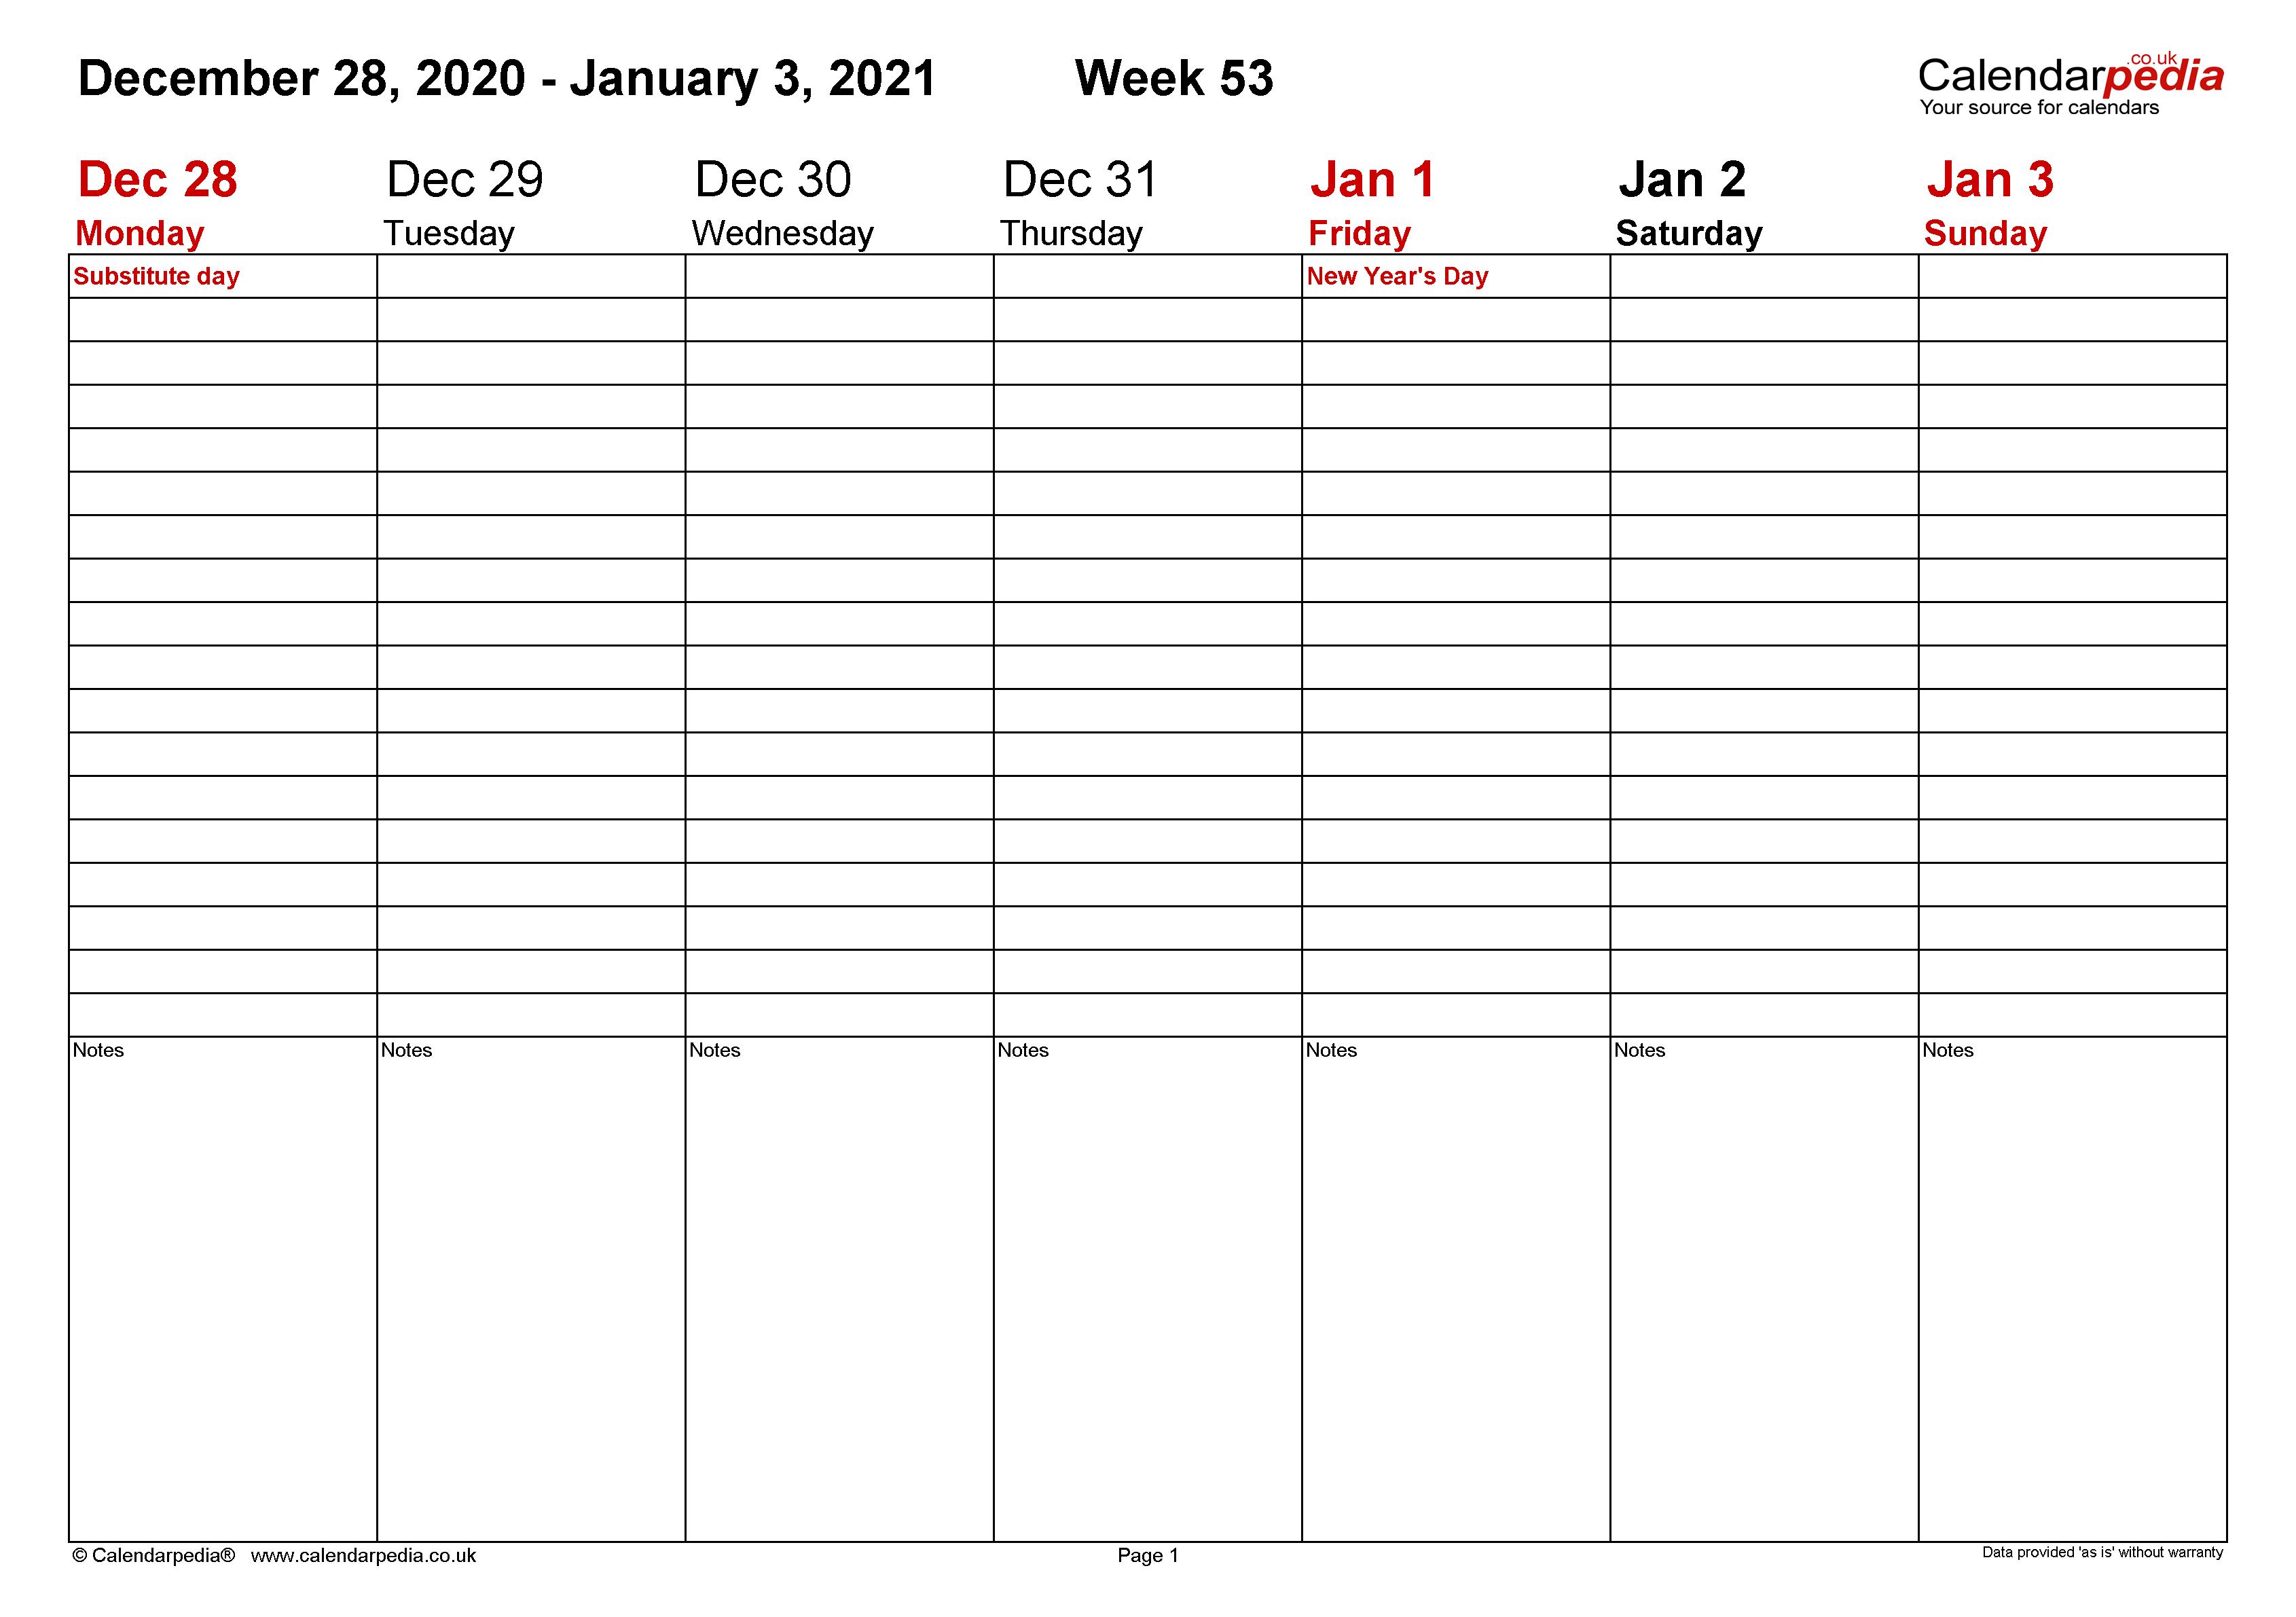 Free Editable Weekly 2021 Calendar - Free 2021 Calendar ...